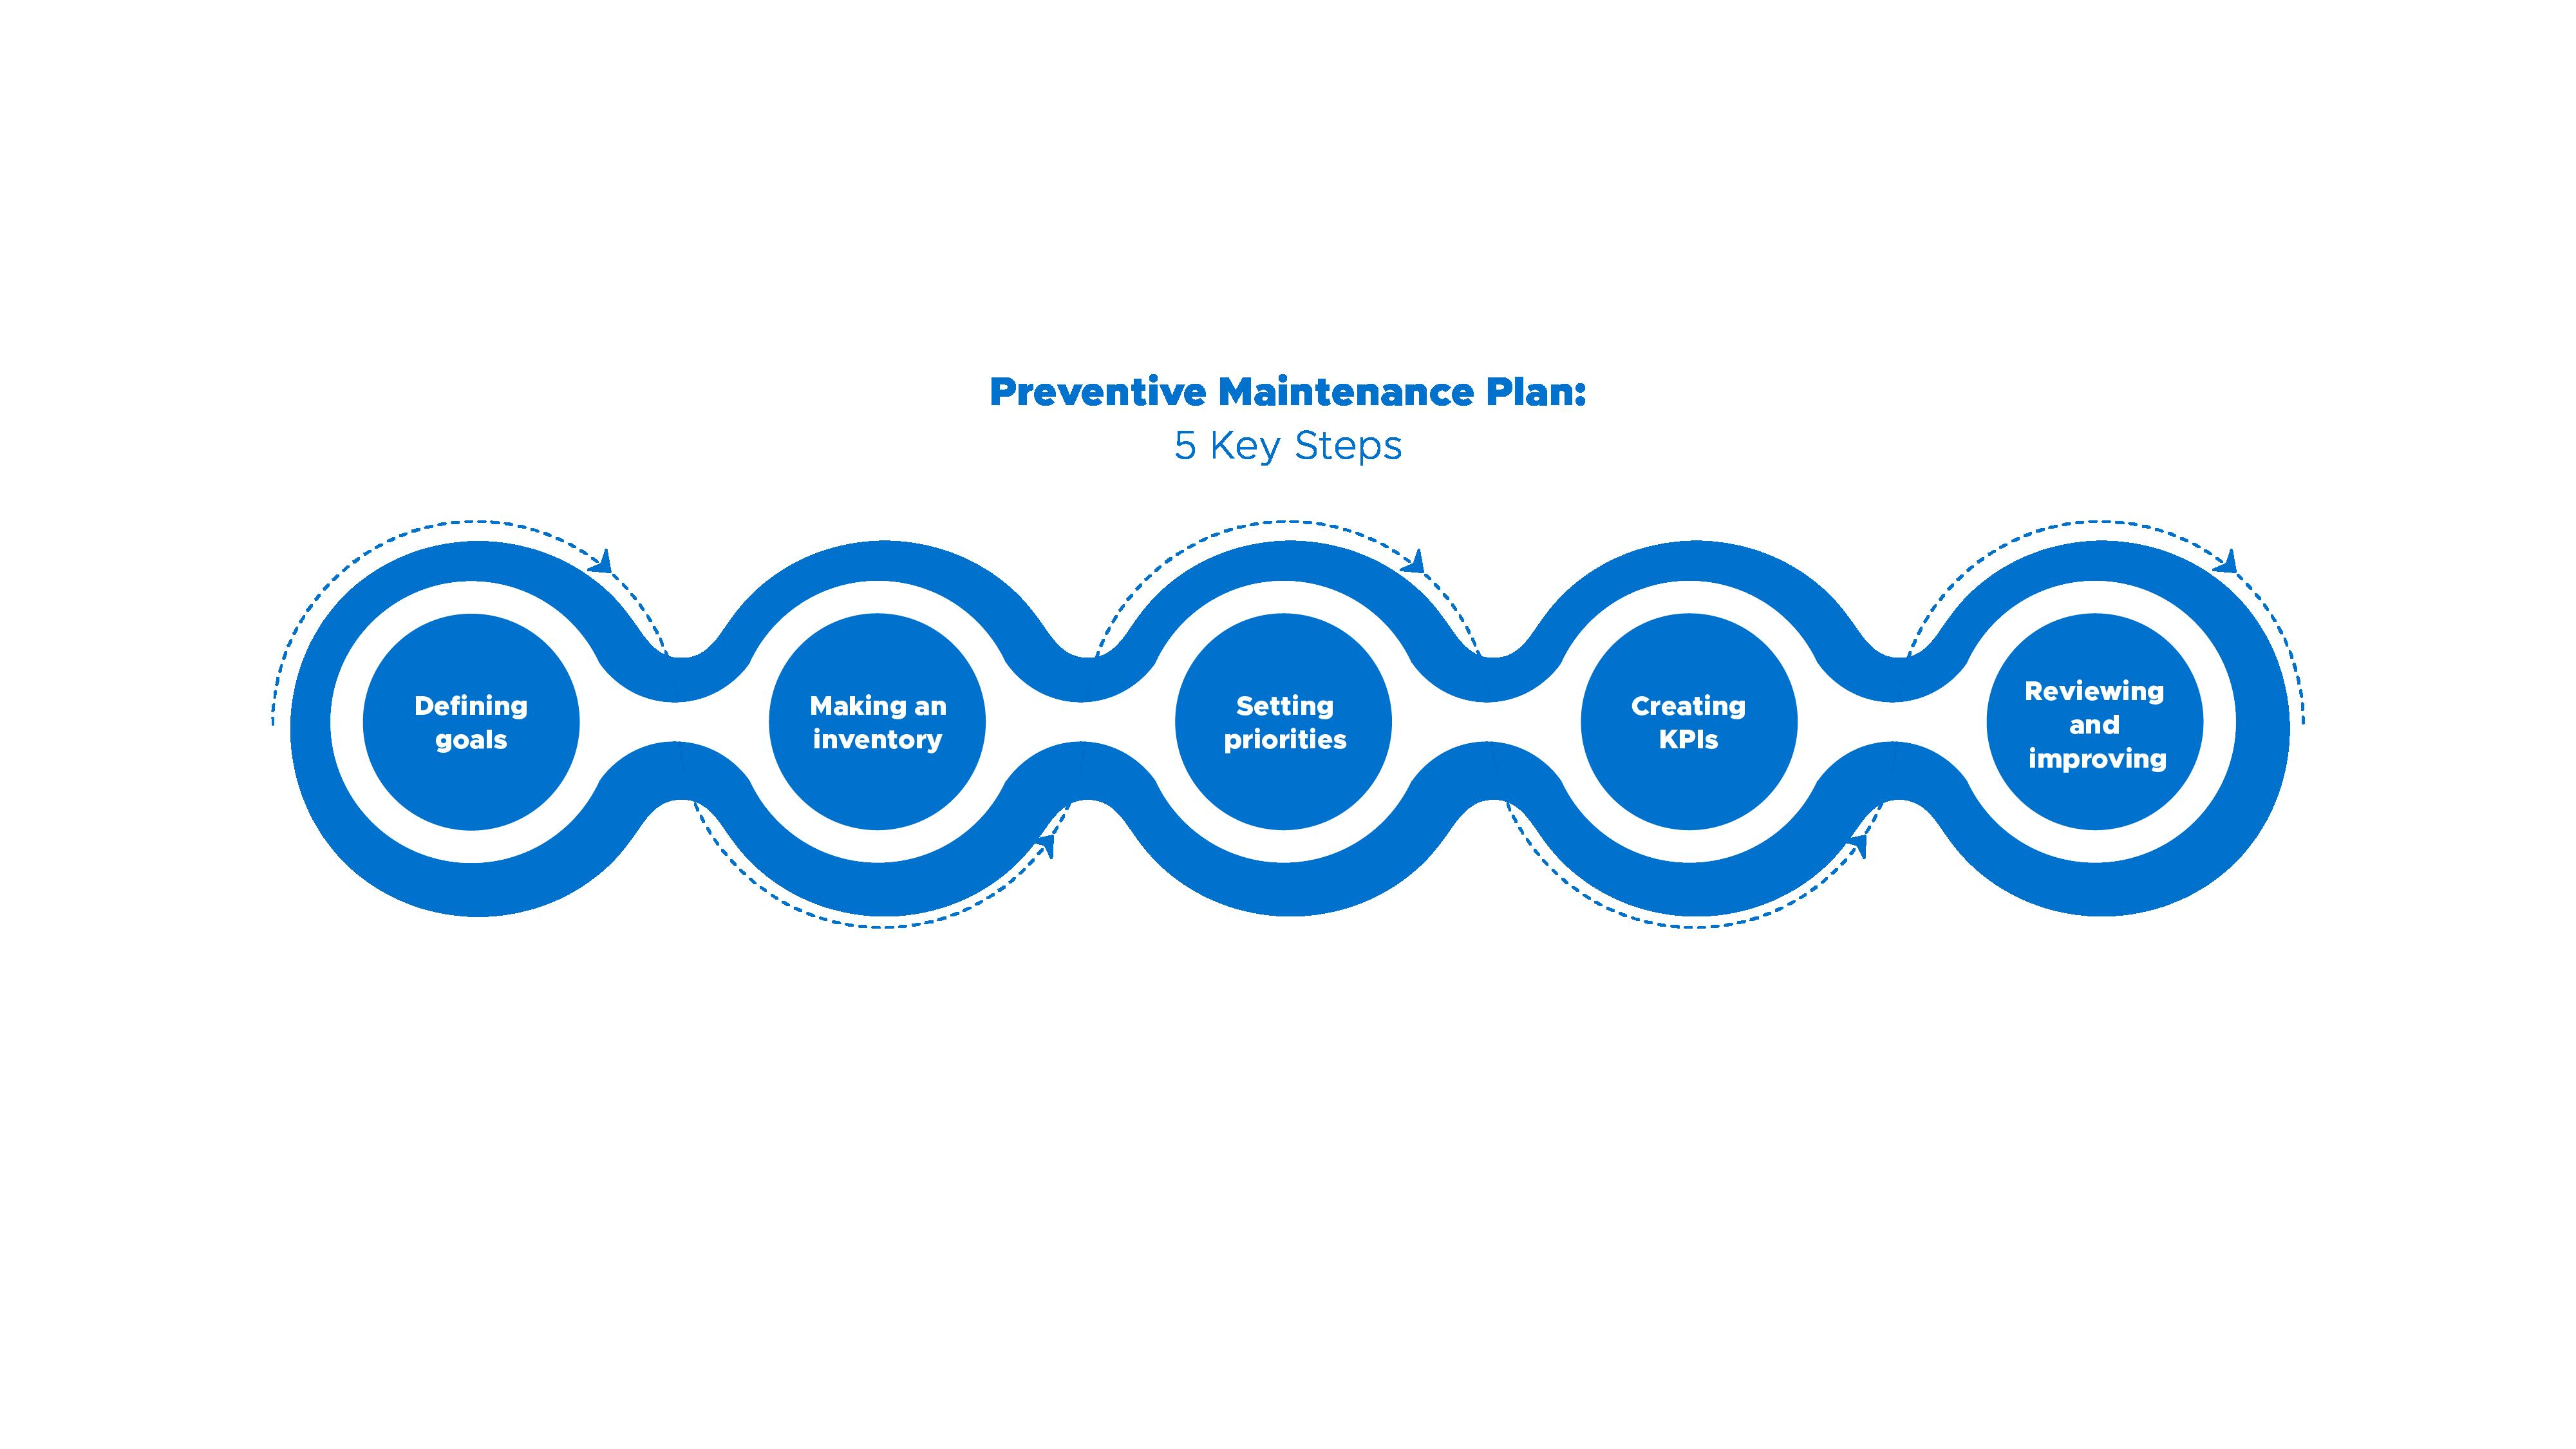 5 essential steps for creating a preventive maintenance plan or program